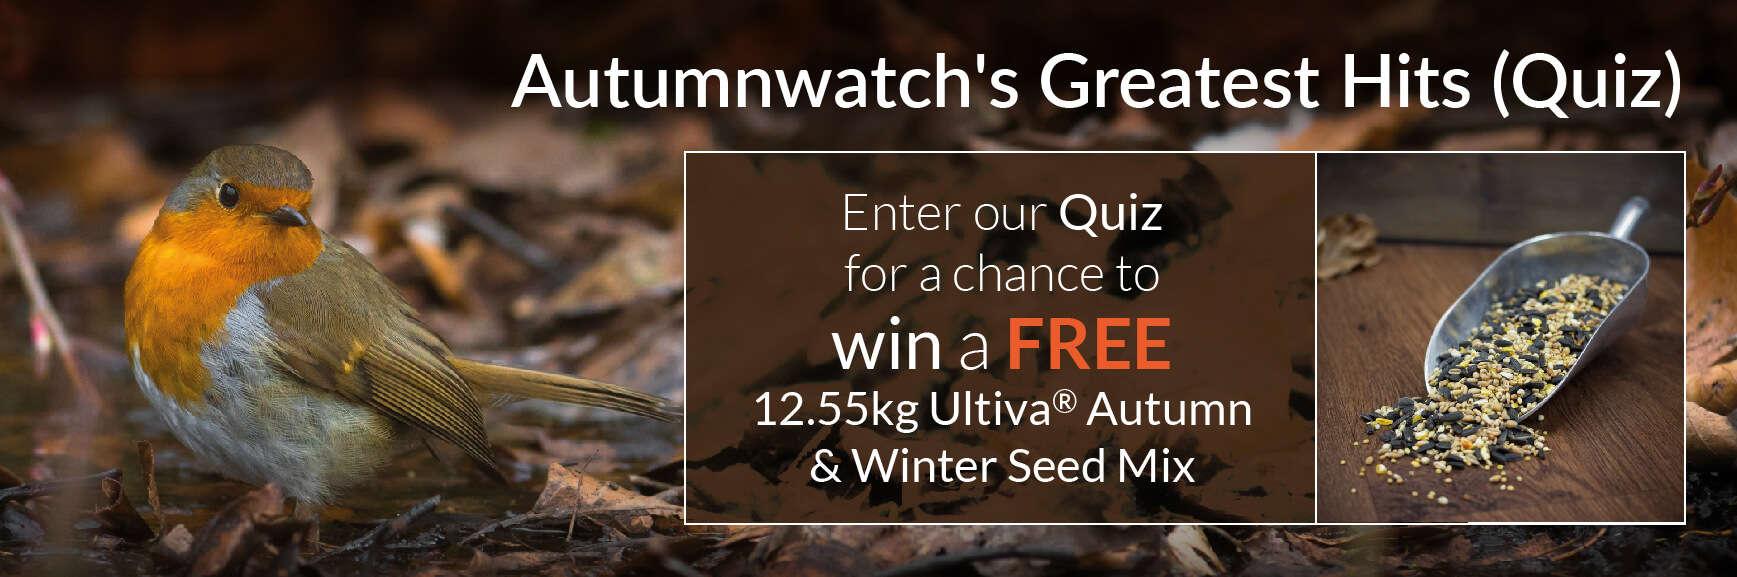 Autumnwatch's Greatest Hits (Quiz)